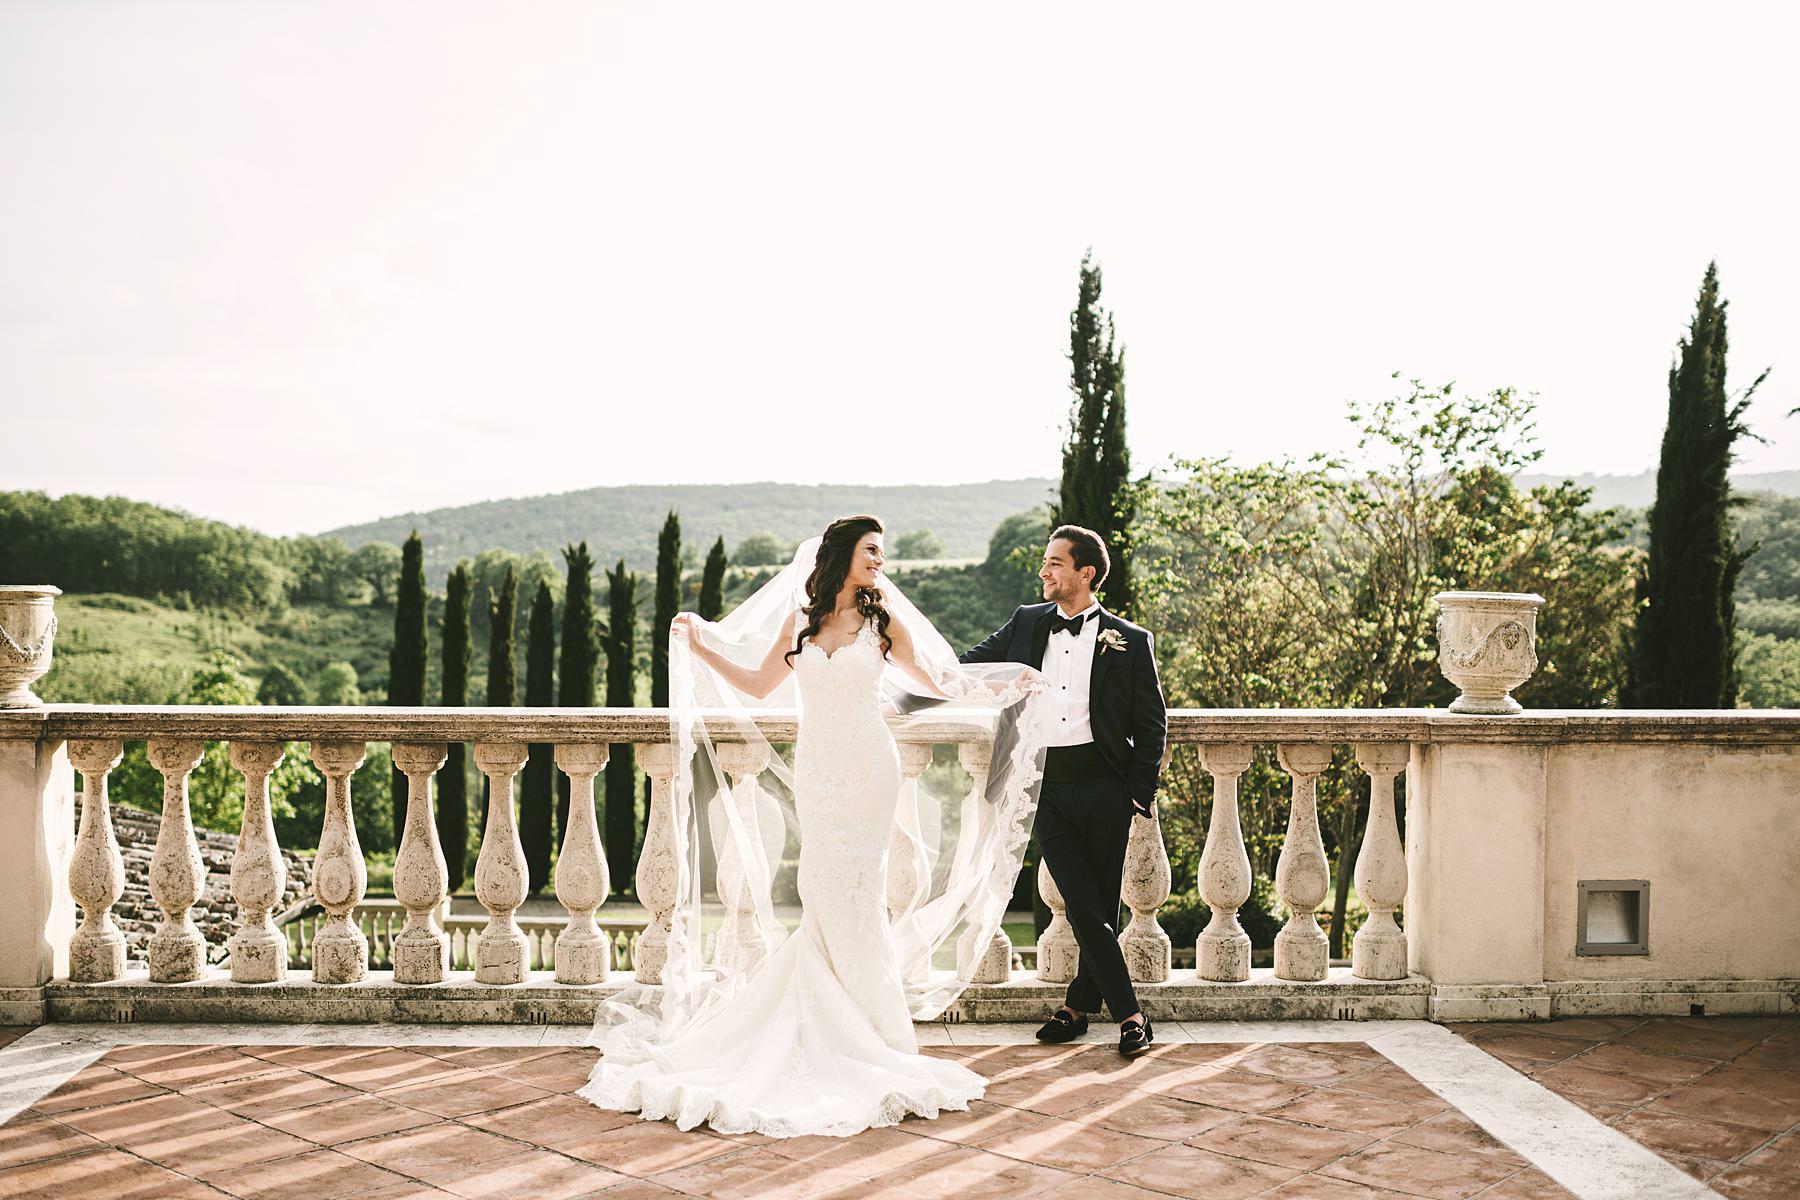 Beautiful bride and groom portrait at Villa La Selva venue for destination wedding event in Tuscany countryside